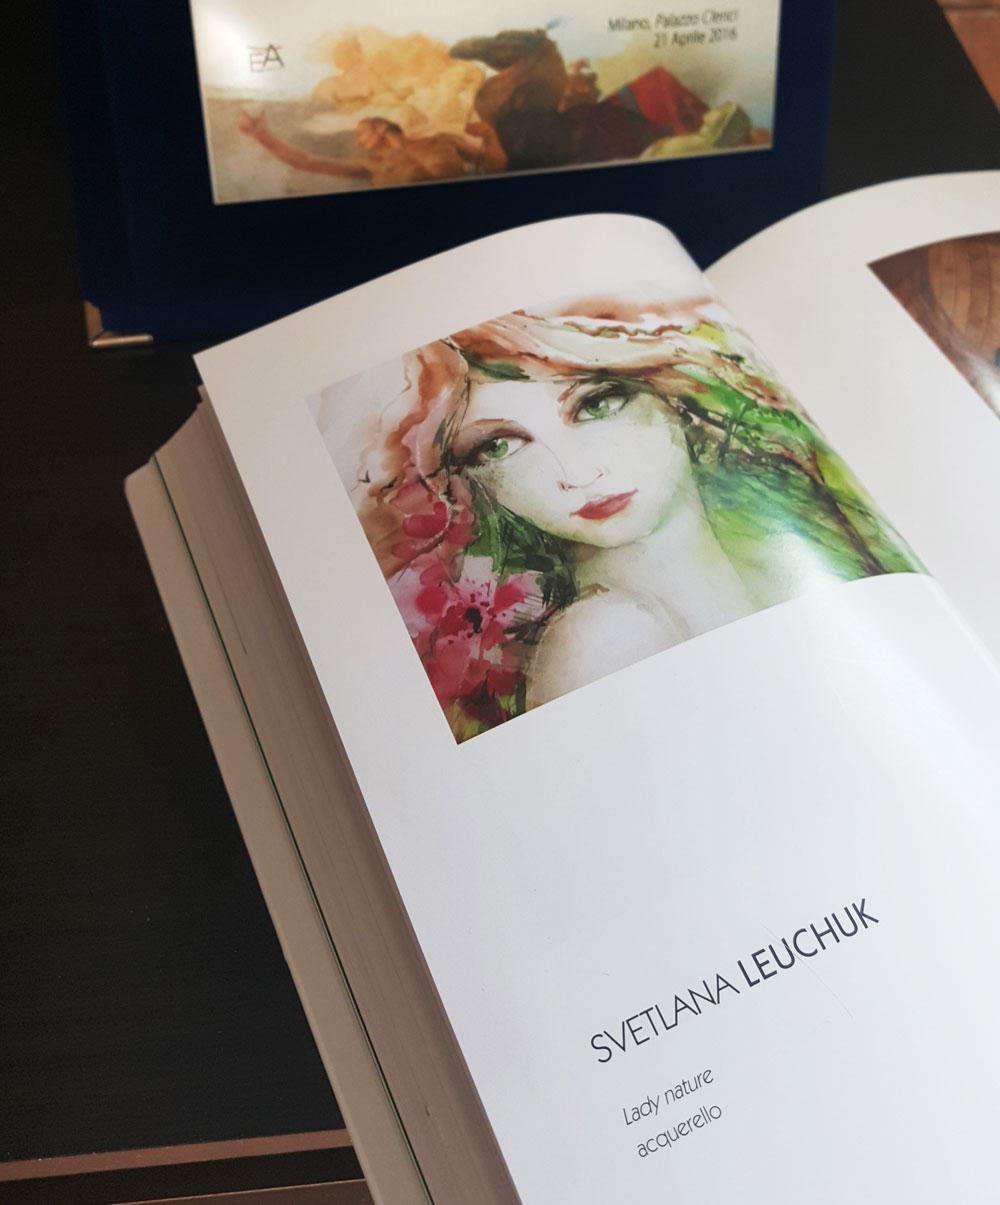 premio-tiepolo-lady-nature-publication-Svetlana-Leuchuk